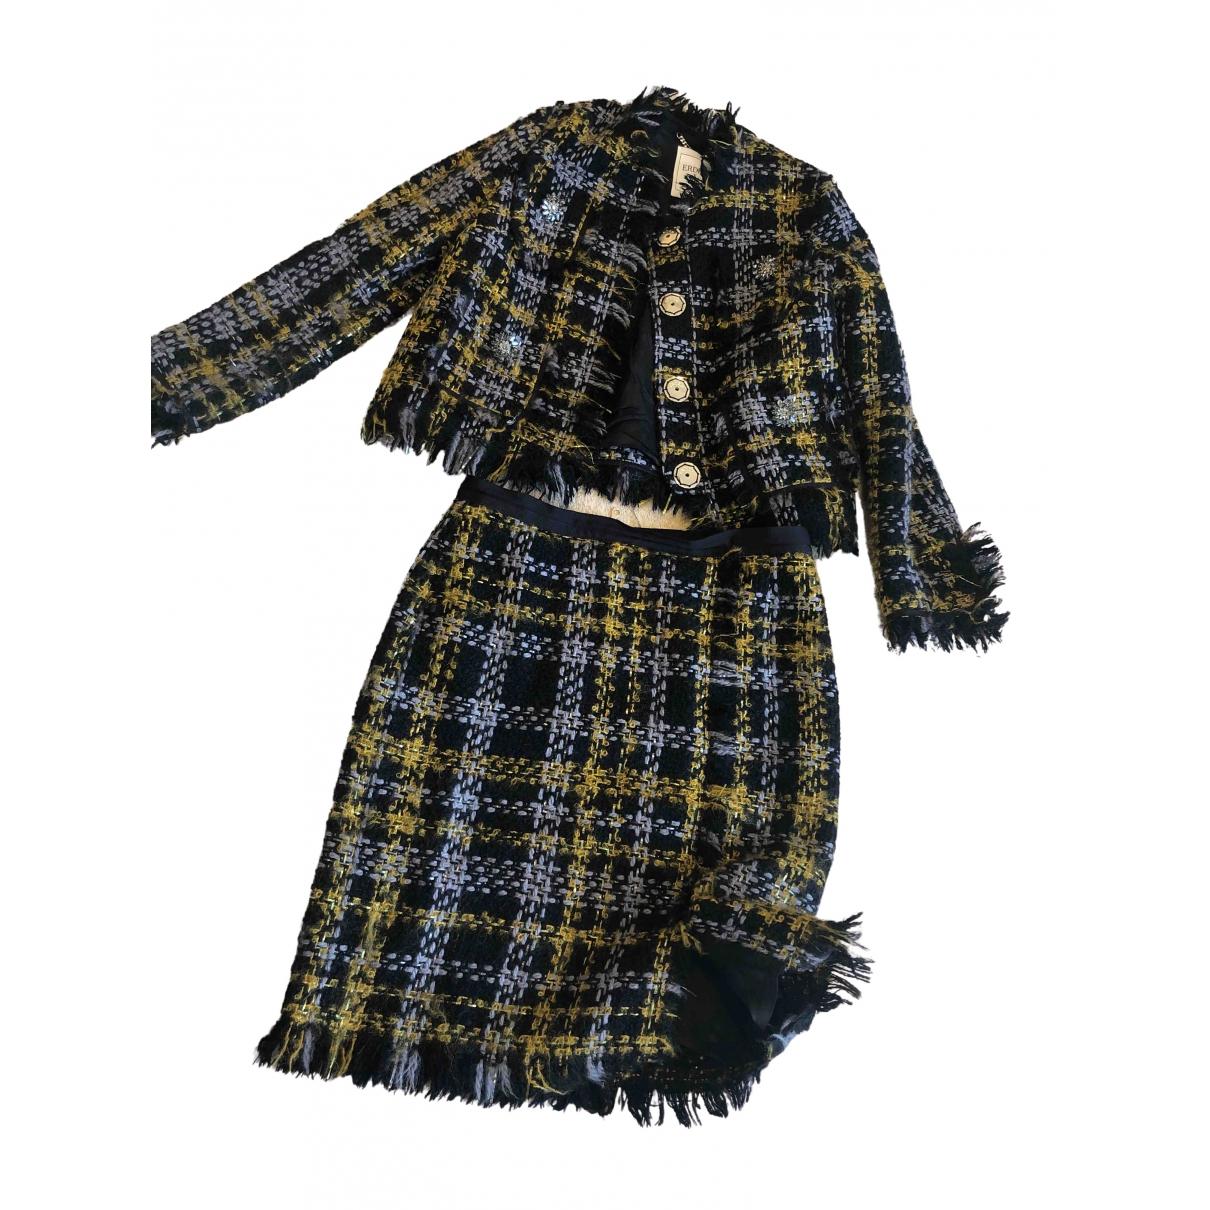 Erdem X H&m \N Multicolour Wool jacket for Women 38 FR